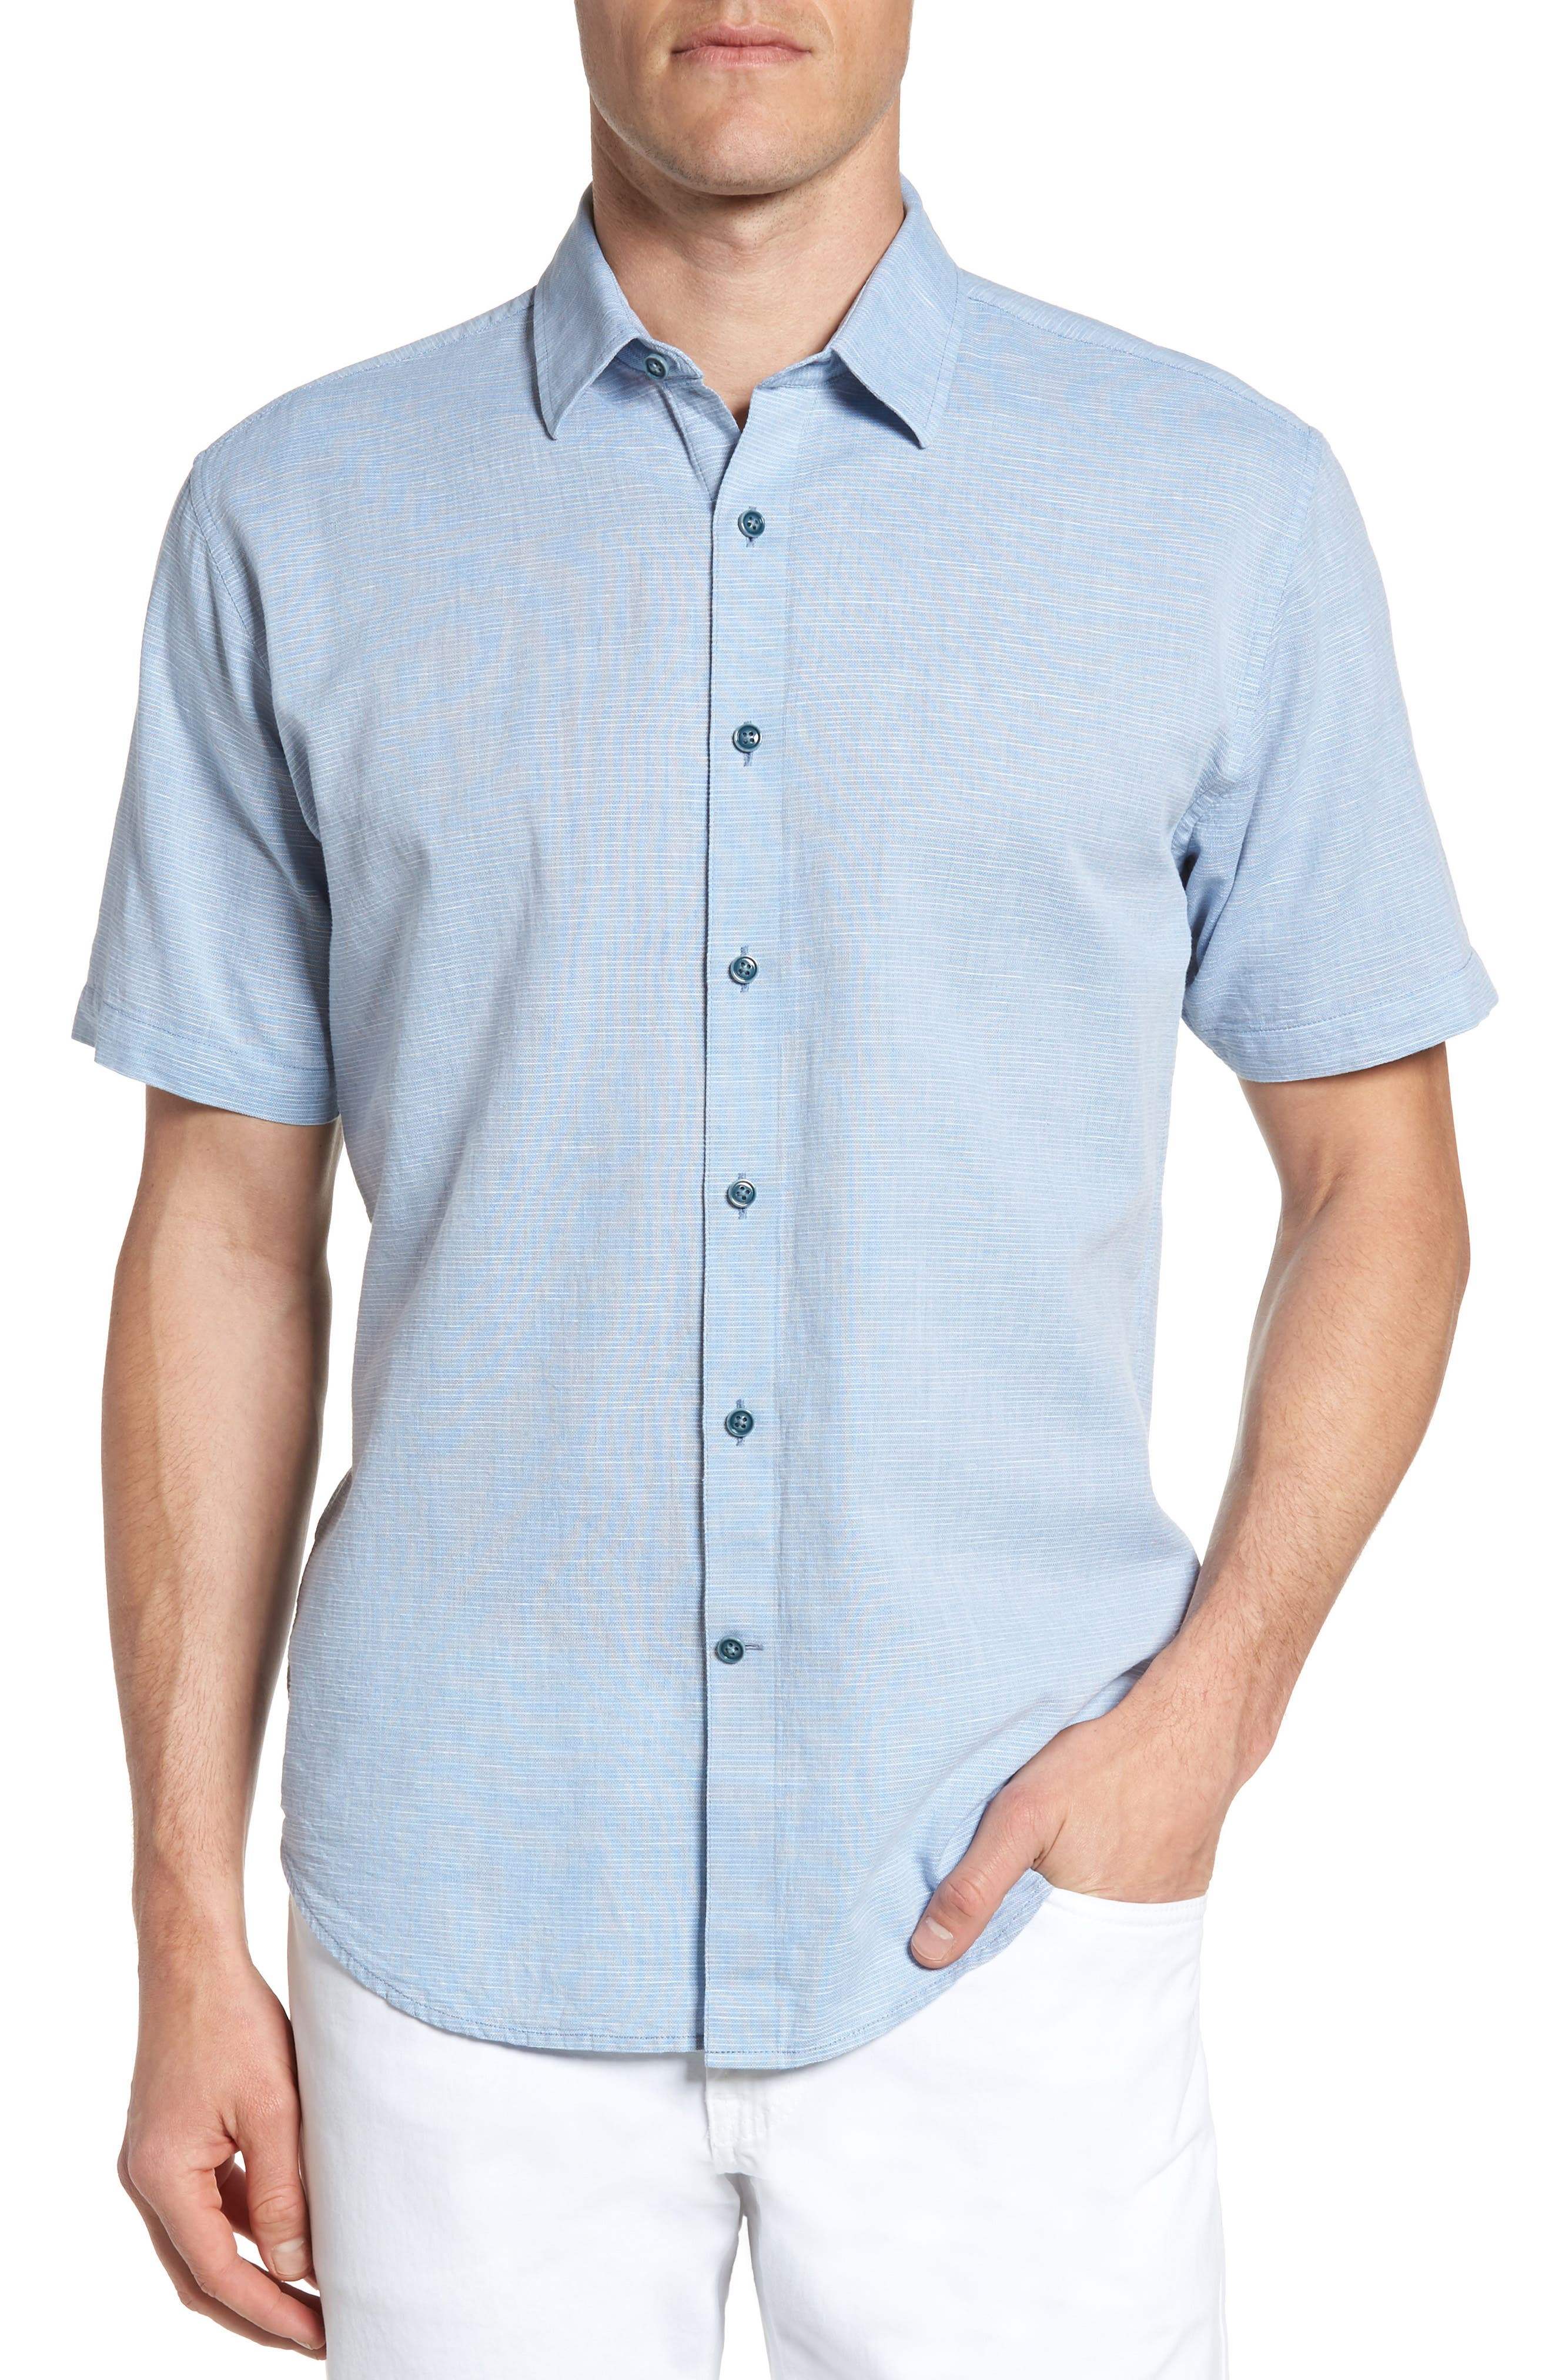 Alternate Image 1 Selected - James Campbell 'Ellerbe' Regular Fit Short Sleeve Sport Shirt